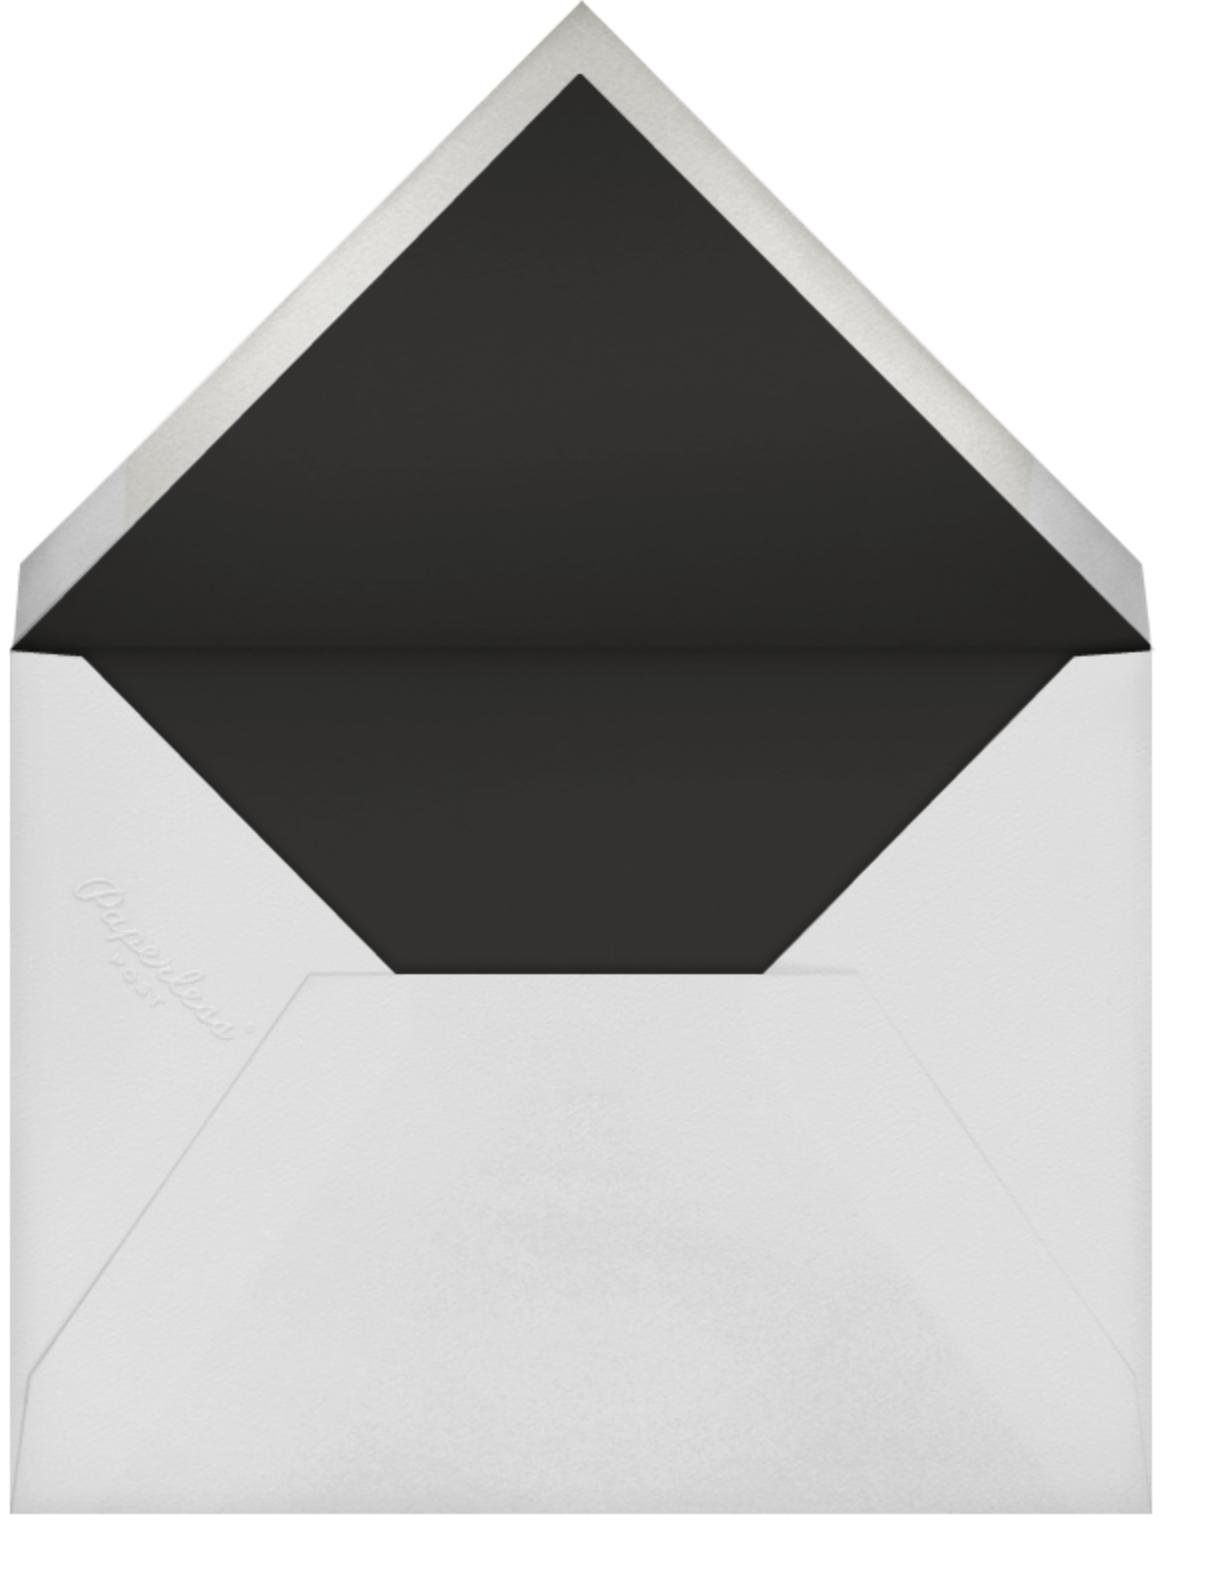 Falling Poppies II - Black/Gold - Oscar de la Renta - General entertaining - envelope back